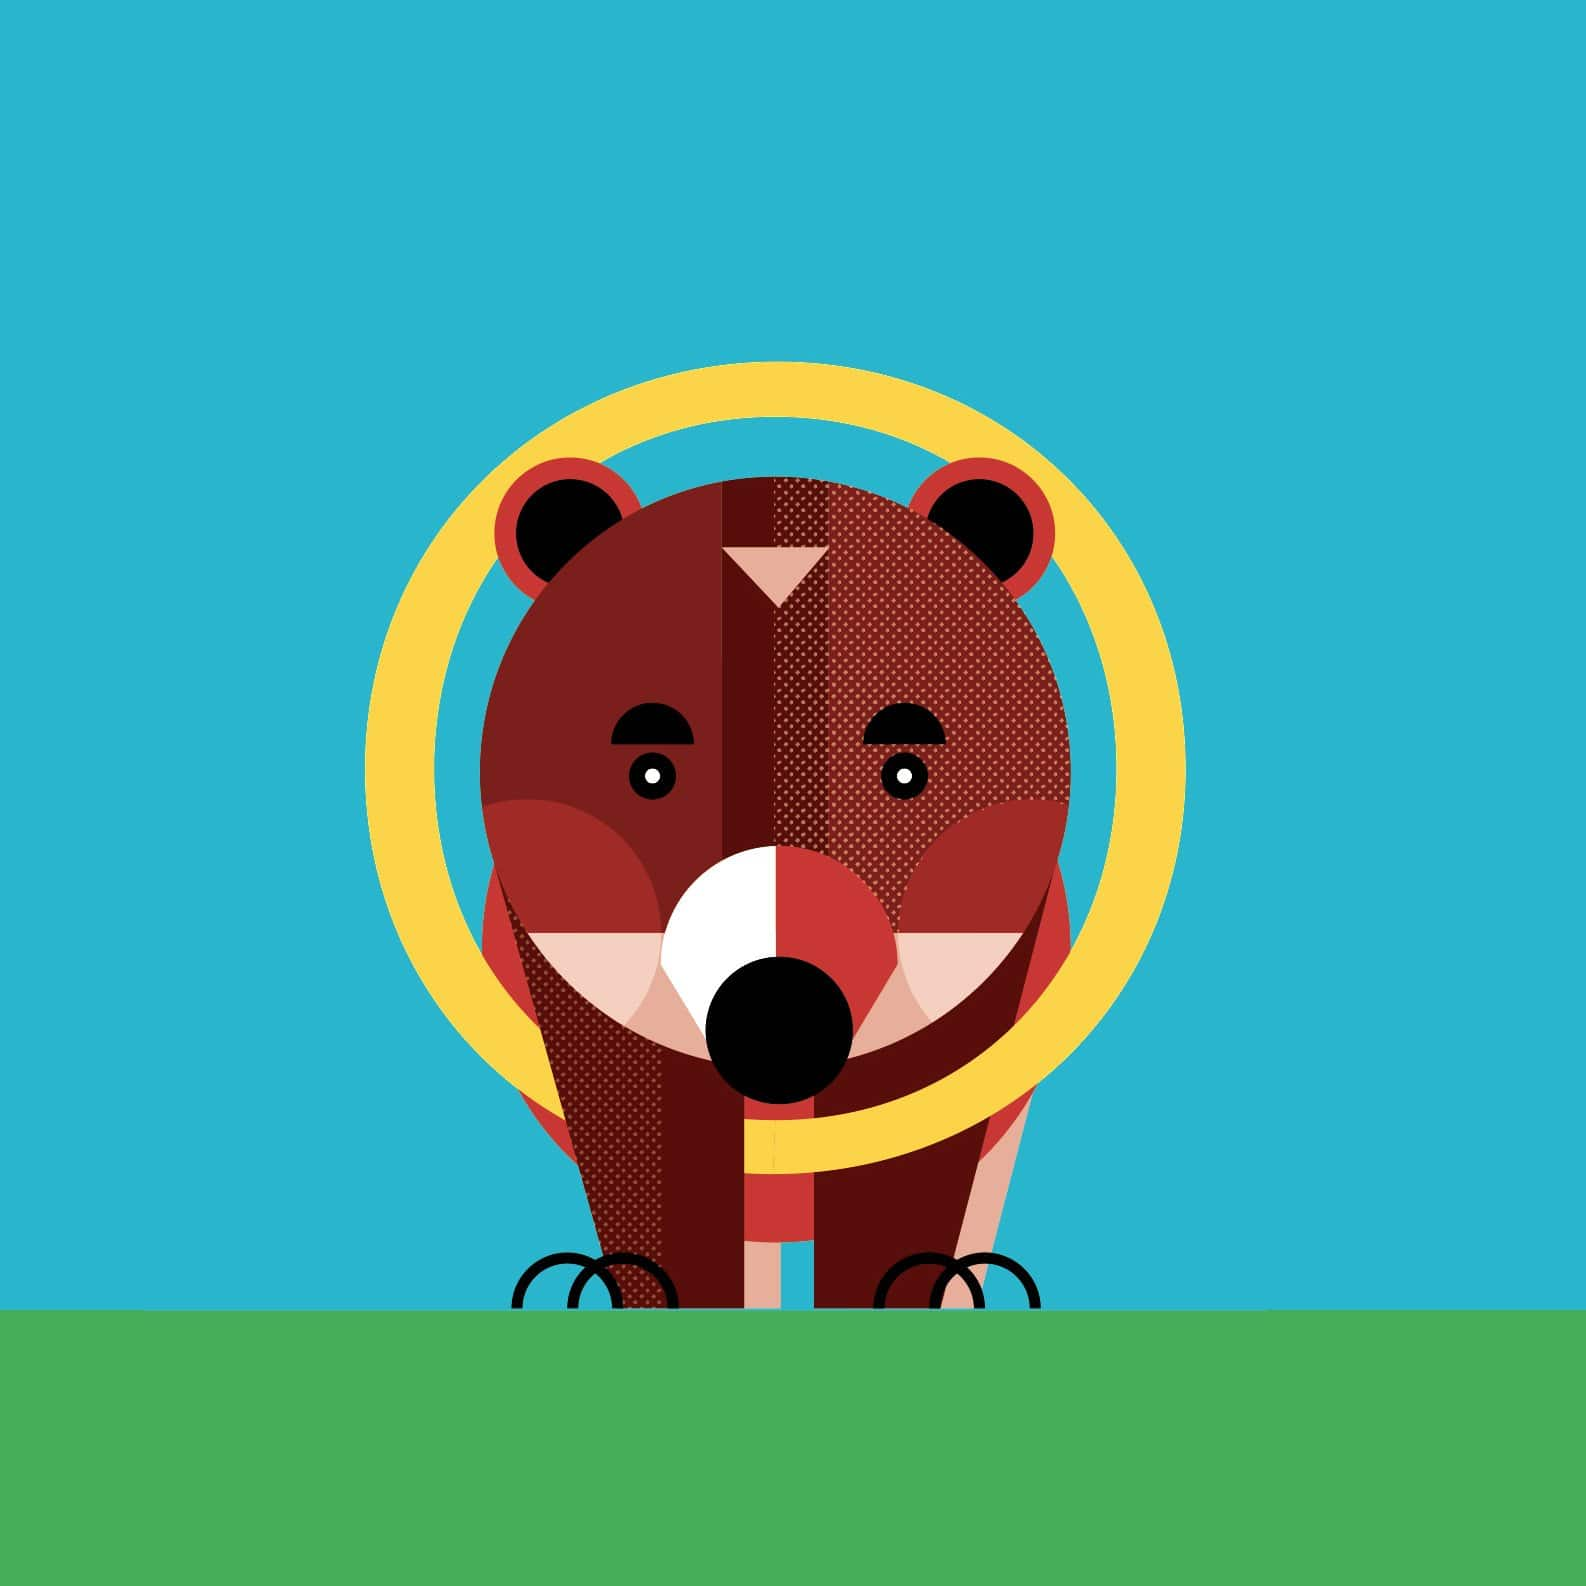 alice-iuri-poster-animal-bear-illustration